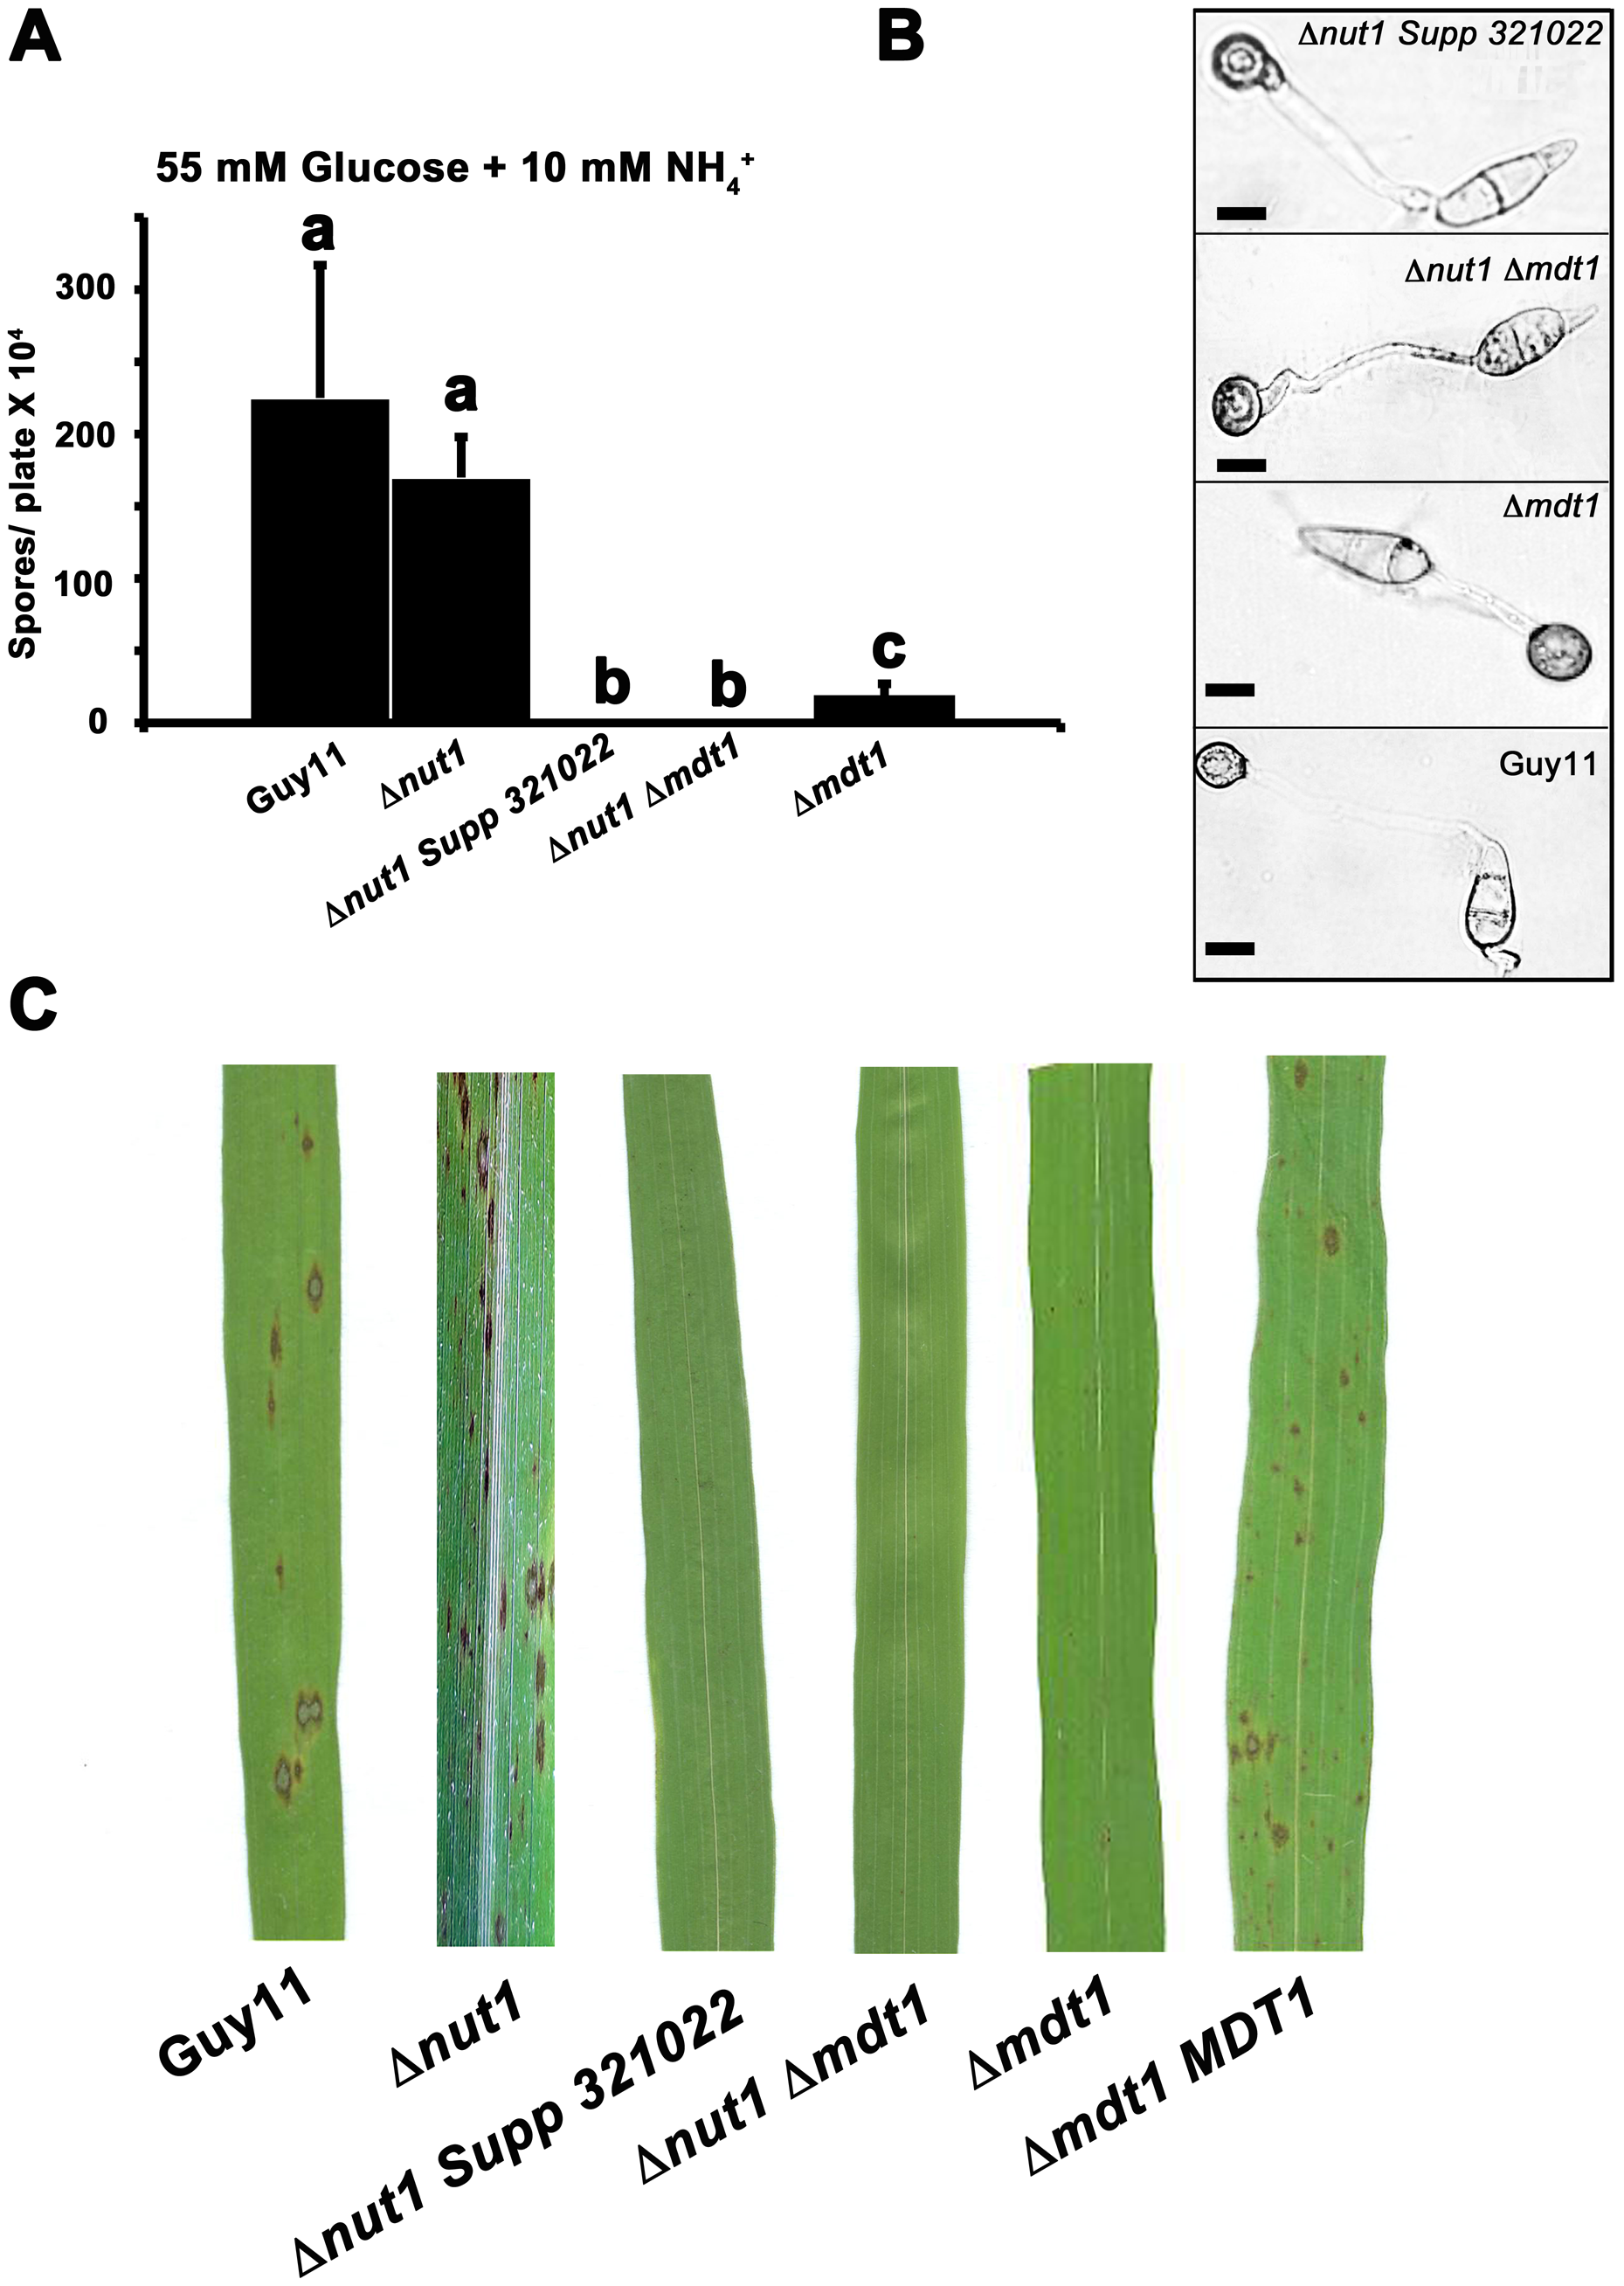 Disrupting Mdt1 function affects sporulation and pathogenesis.